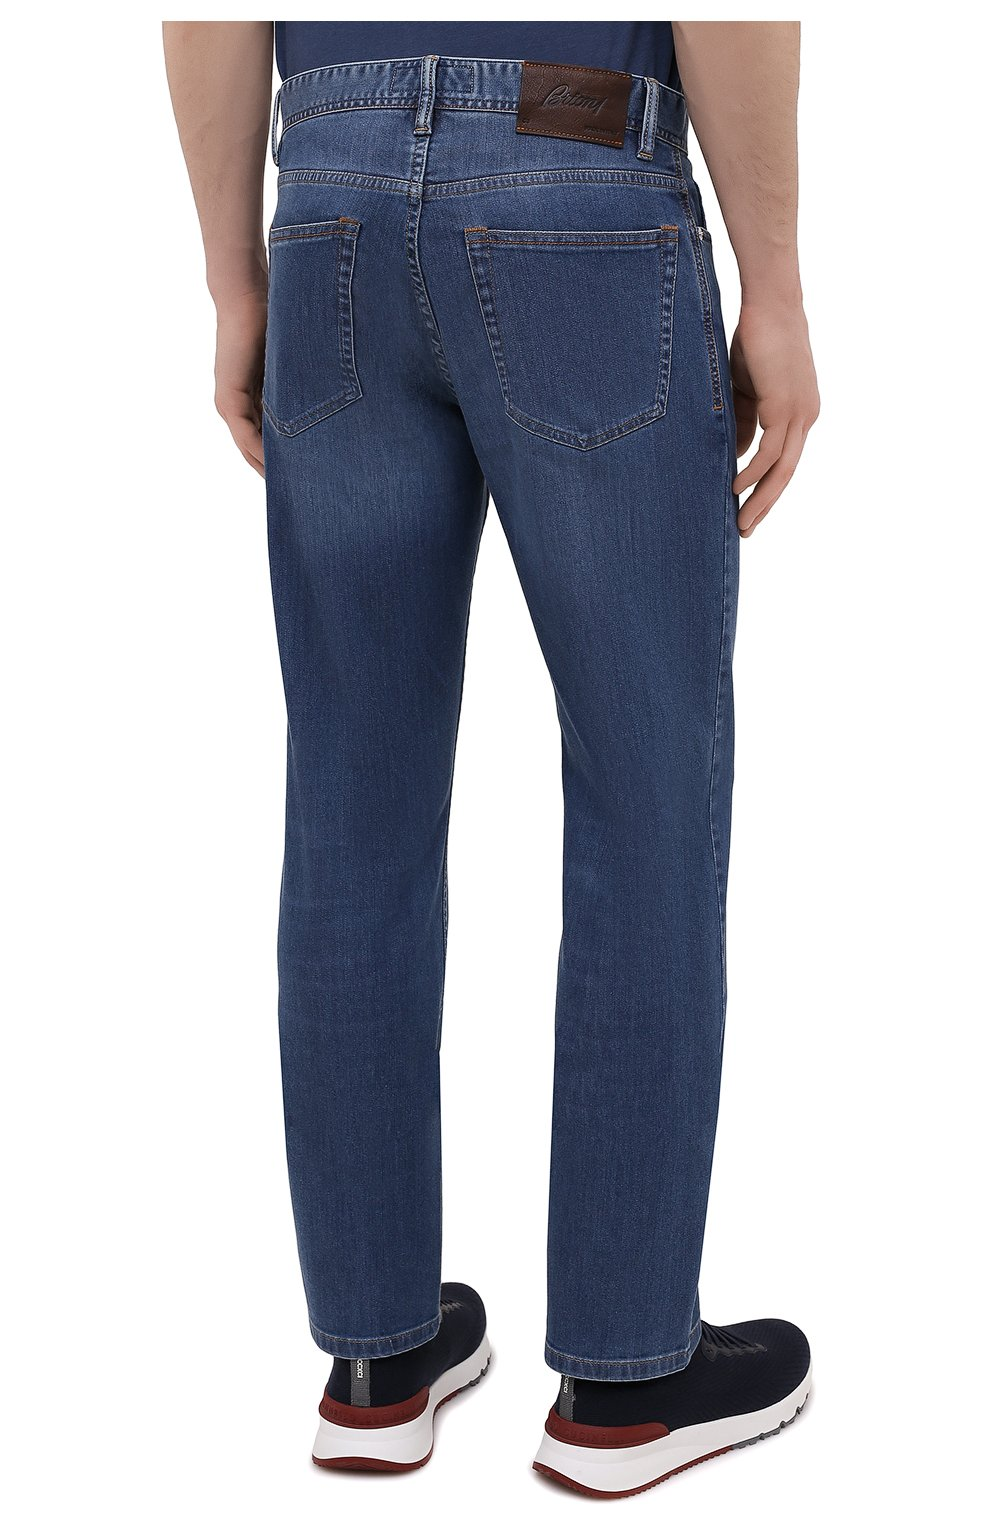 Мужские джинсы BRIONI синего цвета, арт. SPPB0M/P0D06/MERIBEL   Фото 4